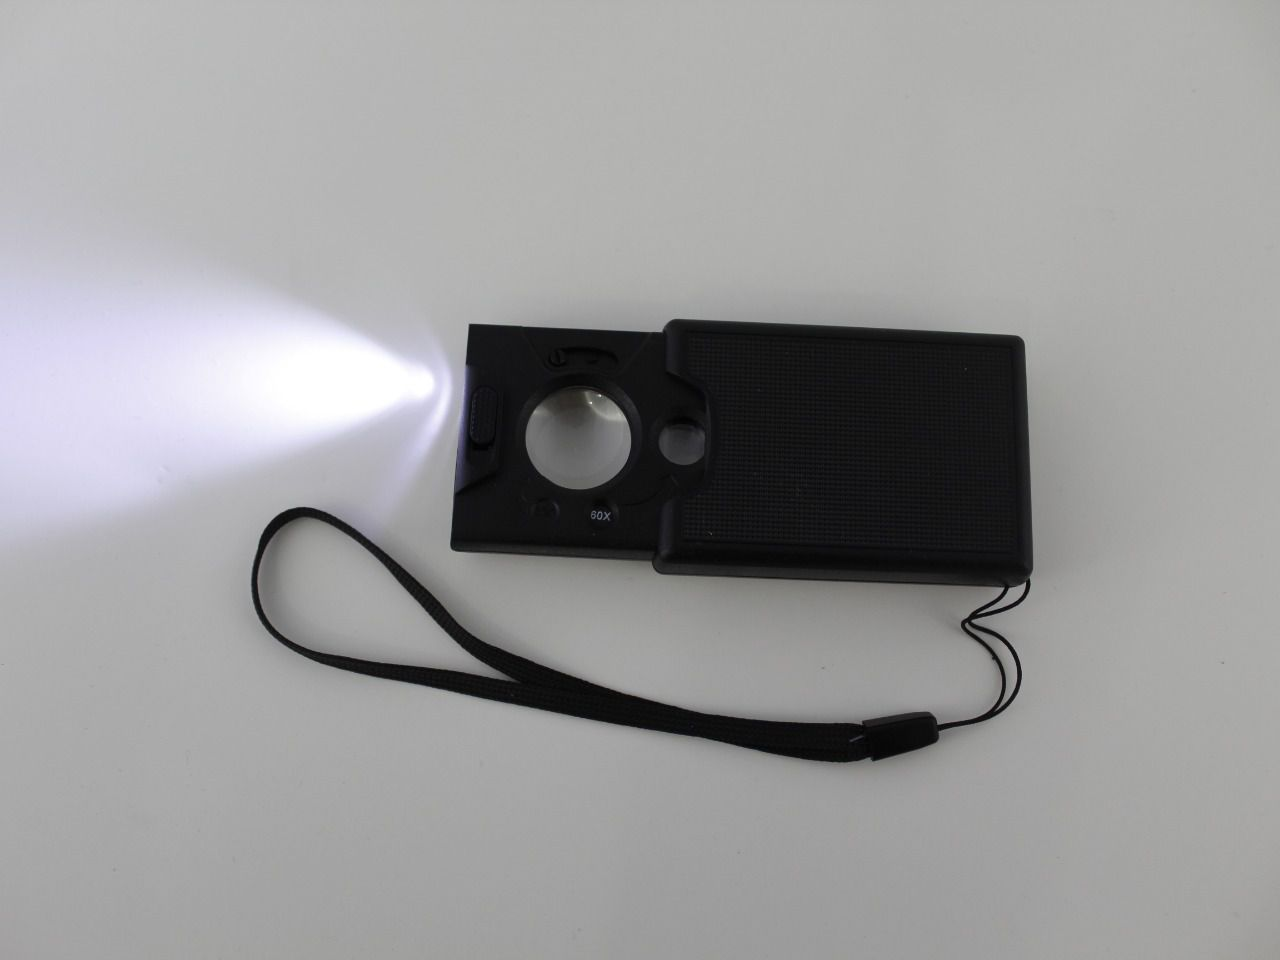 Lupa Agrônoma UV 60x 30x Personalizada